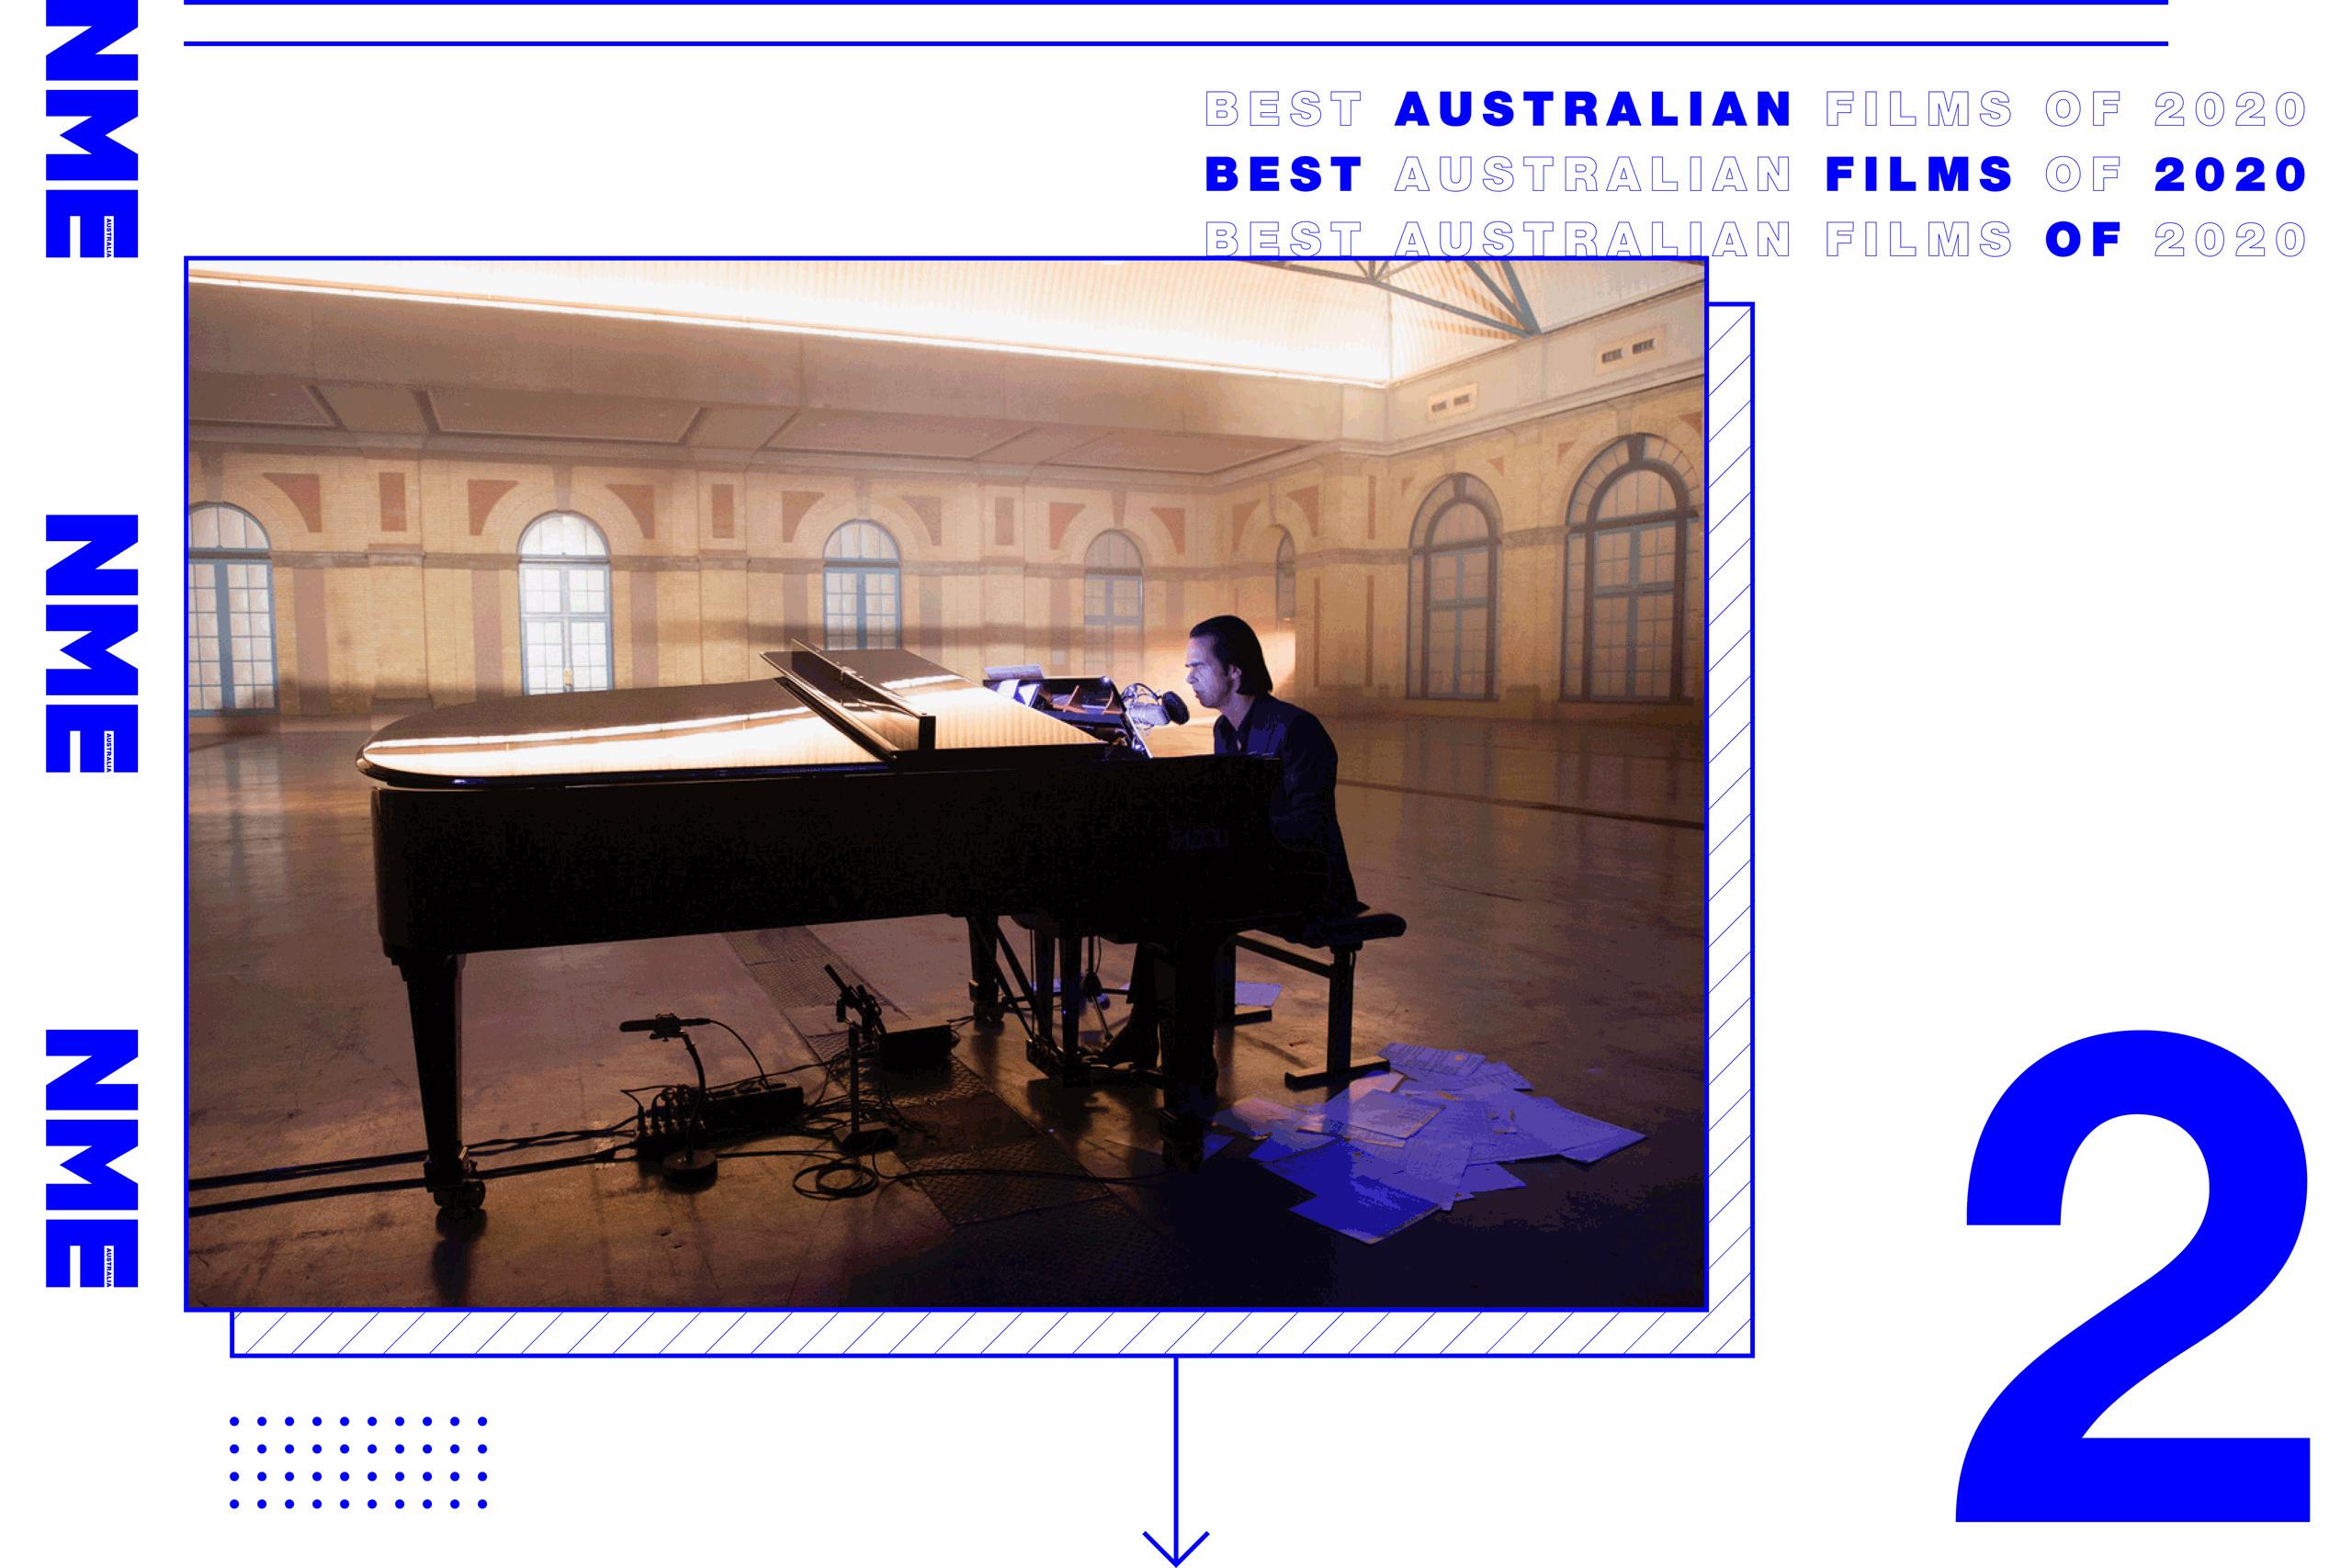 NME Australia Films Of The Year, Idiot Prayer